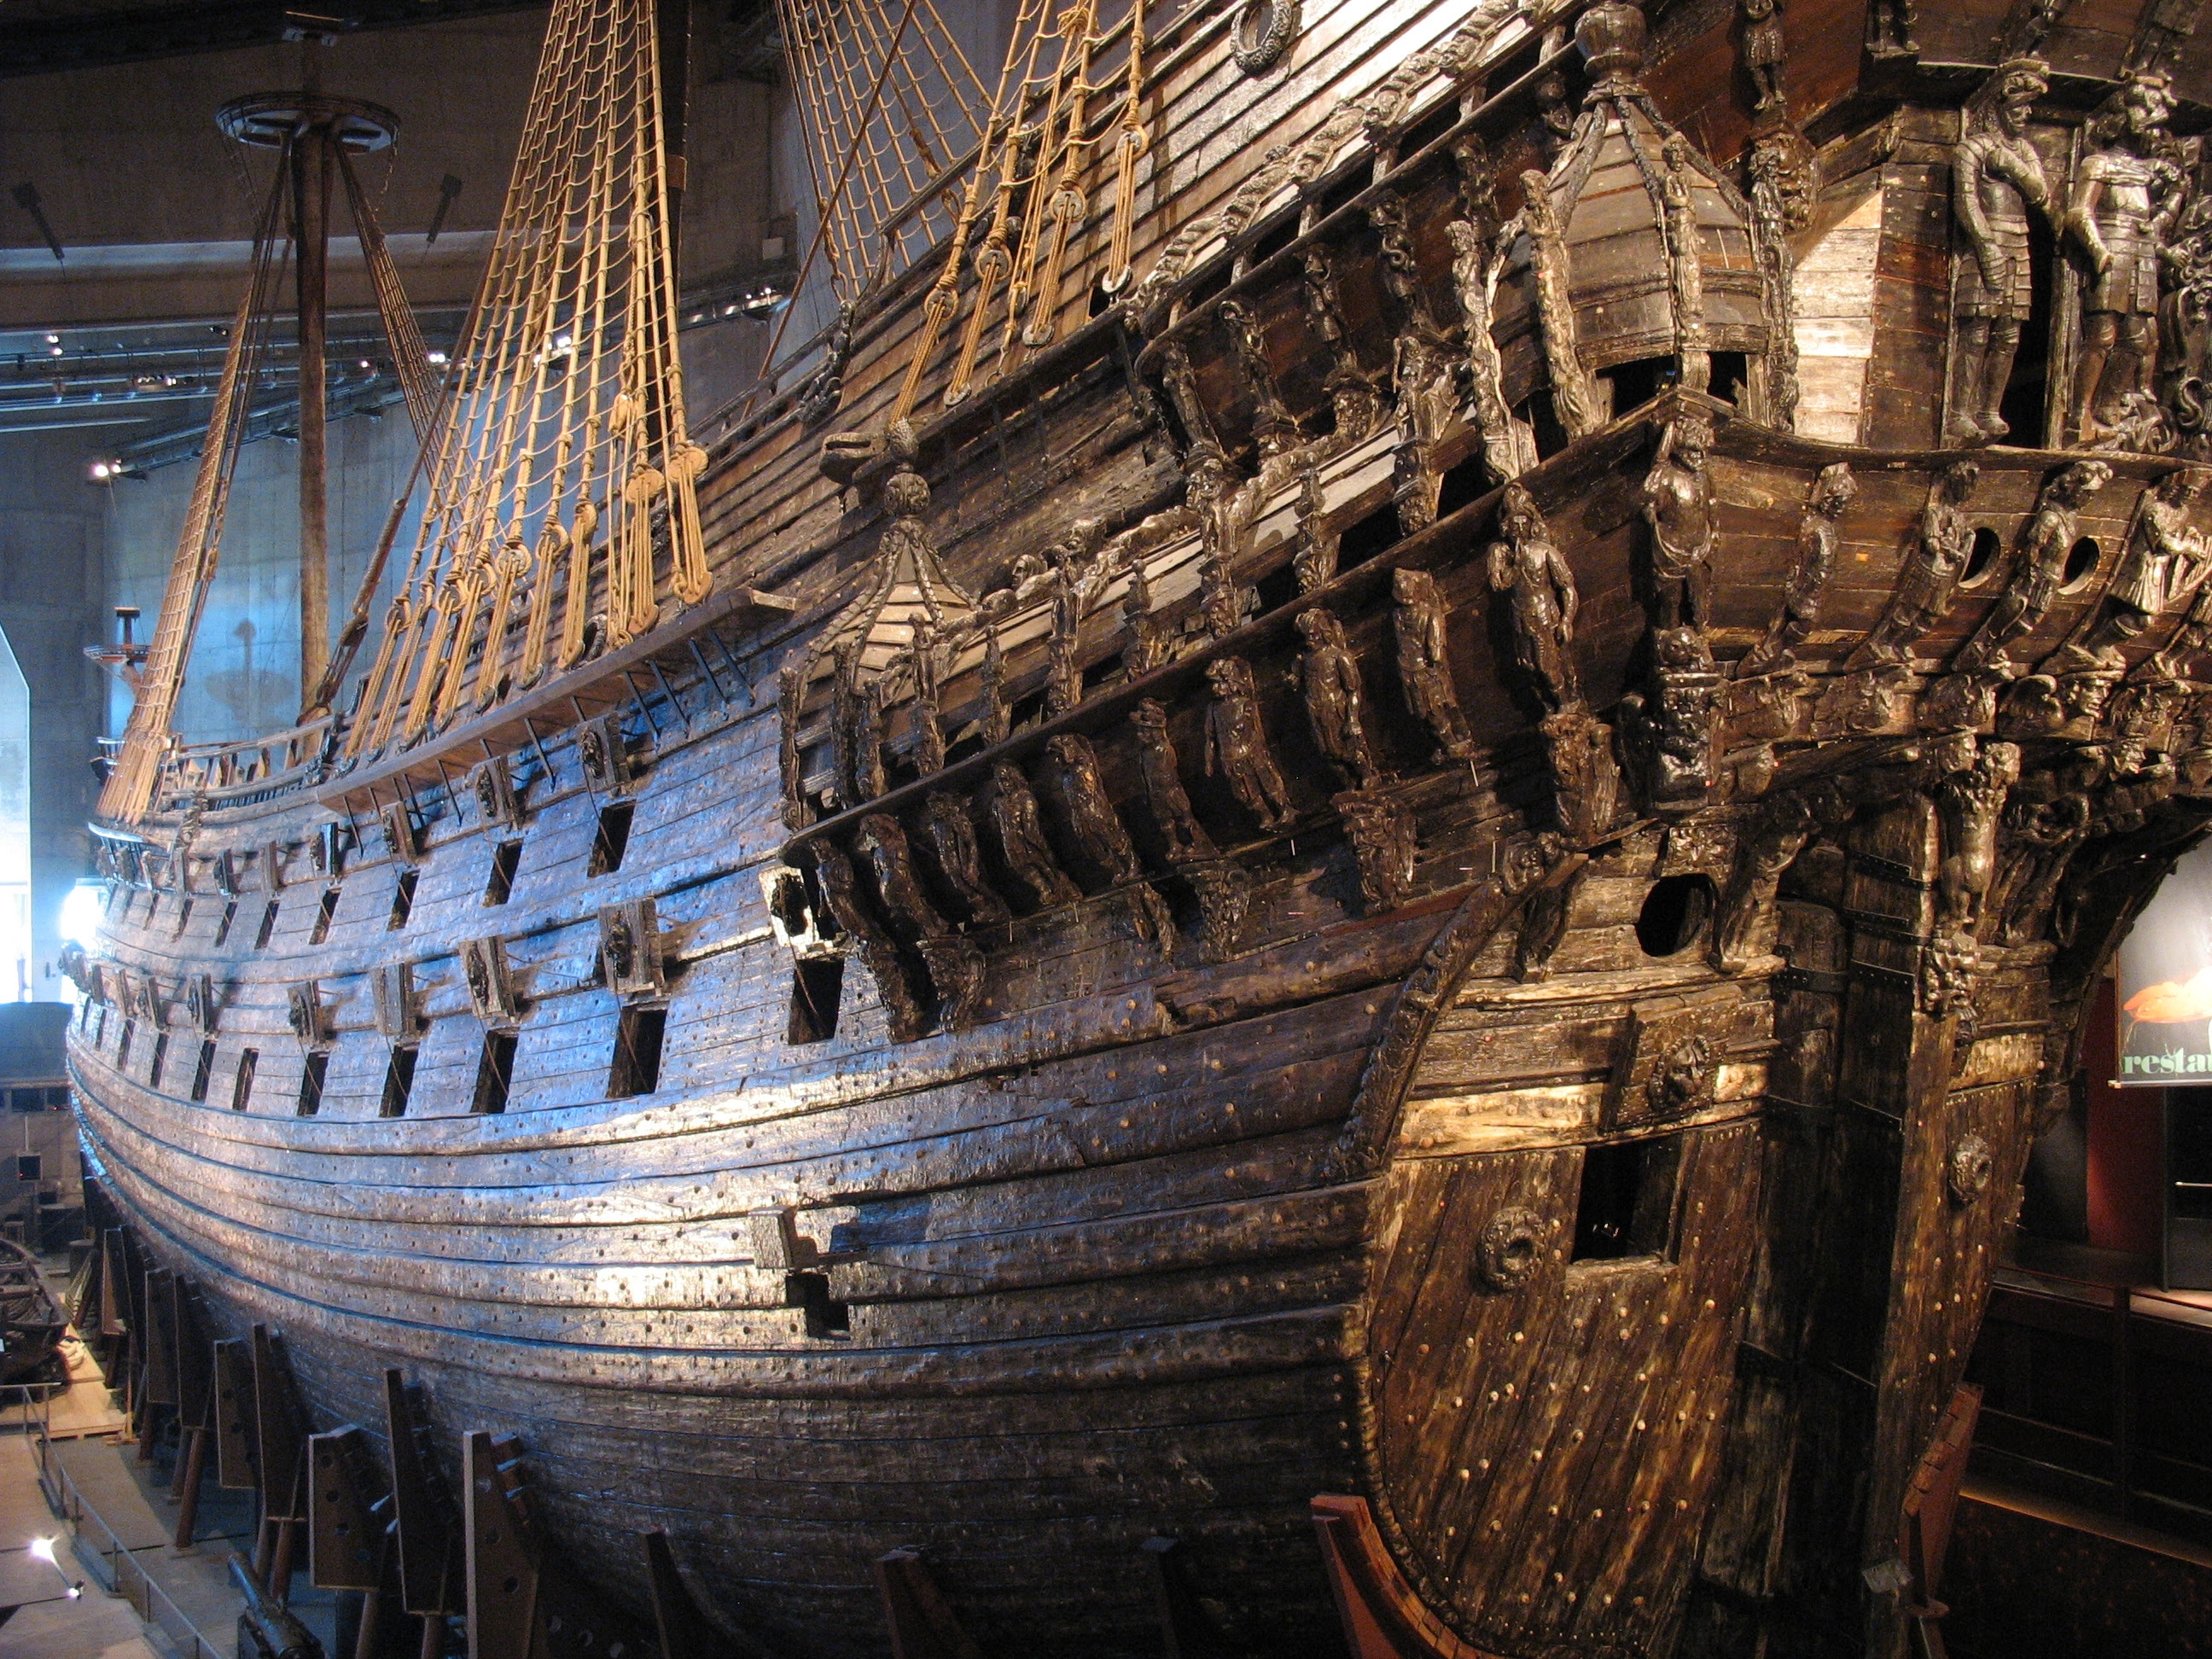 File:Vasa from port2.jpg - Wikipedia, the free encyclopedia